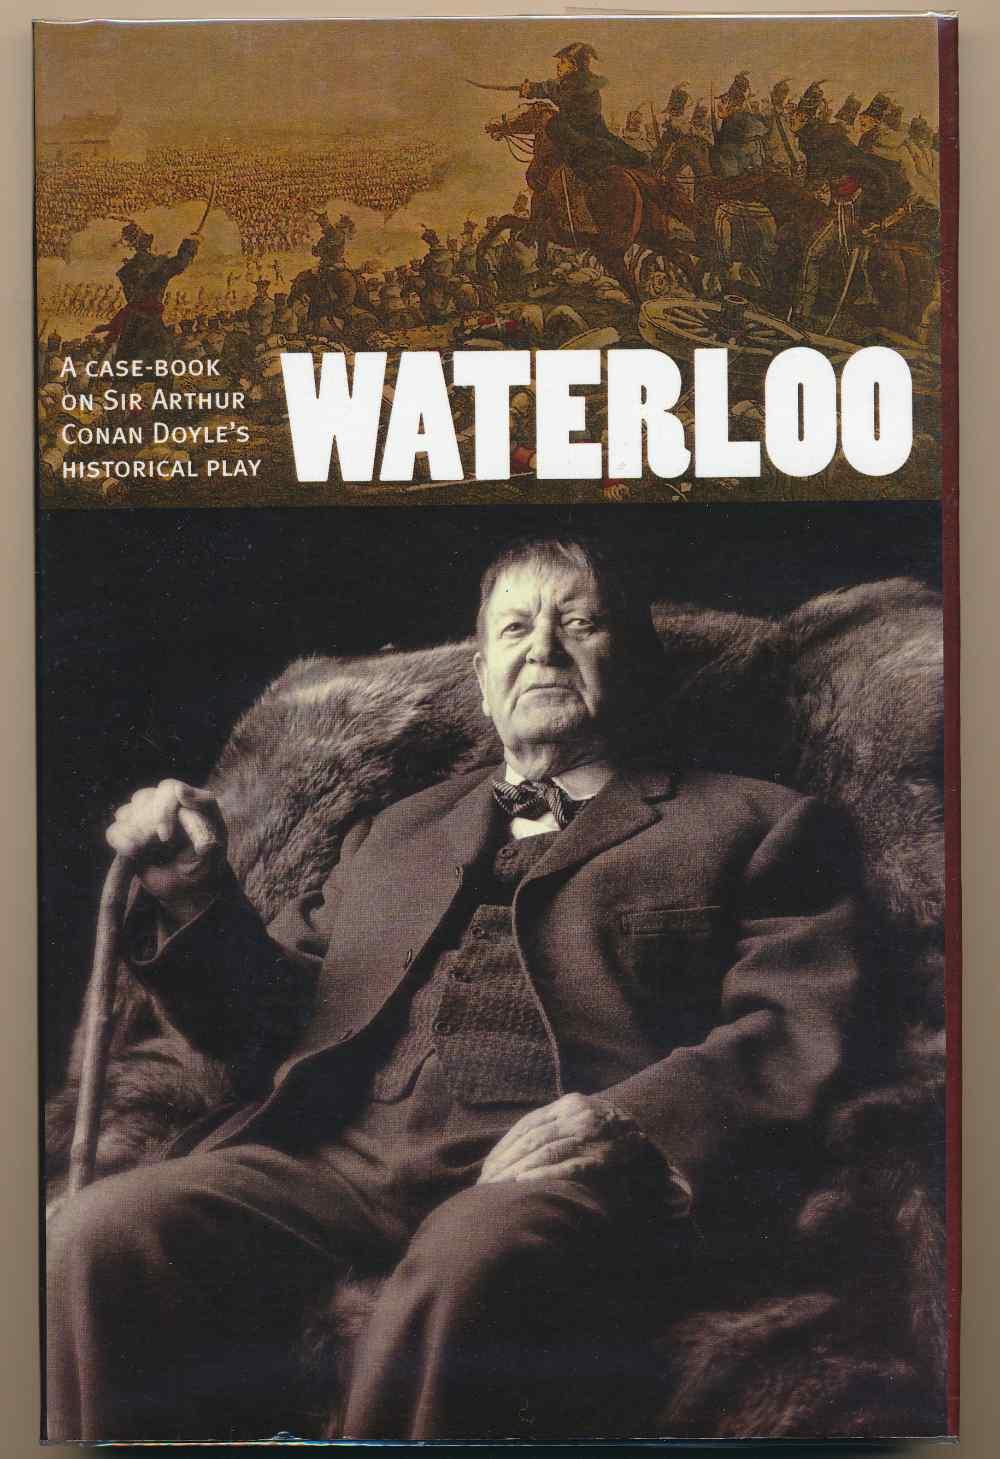 Waterloo : a case-book on Sir Arthur Conan Doyle's historical play